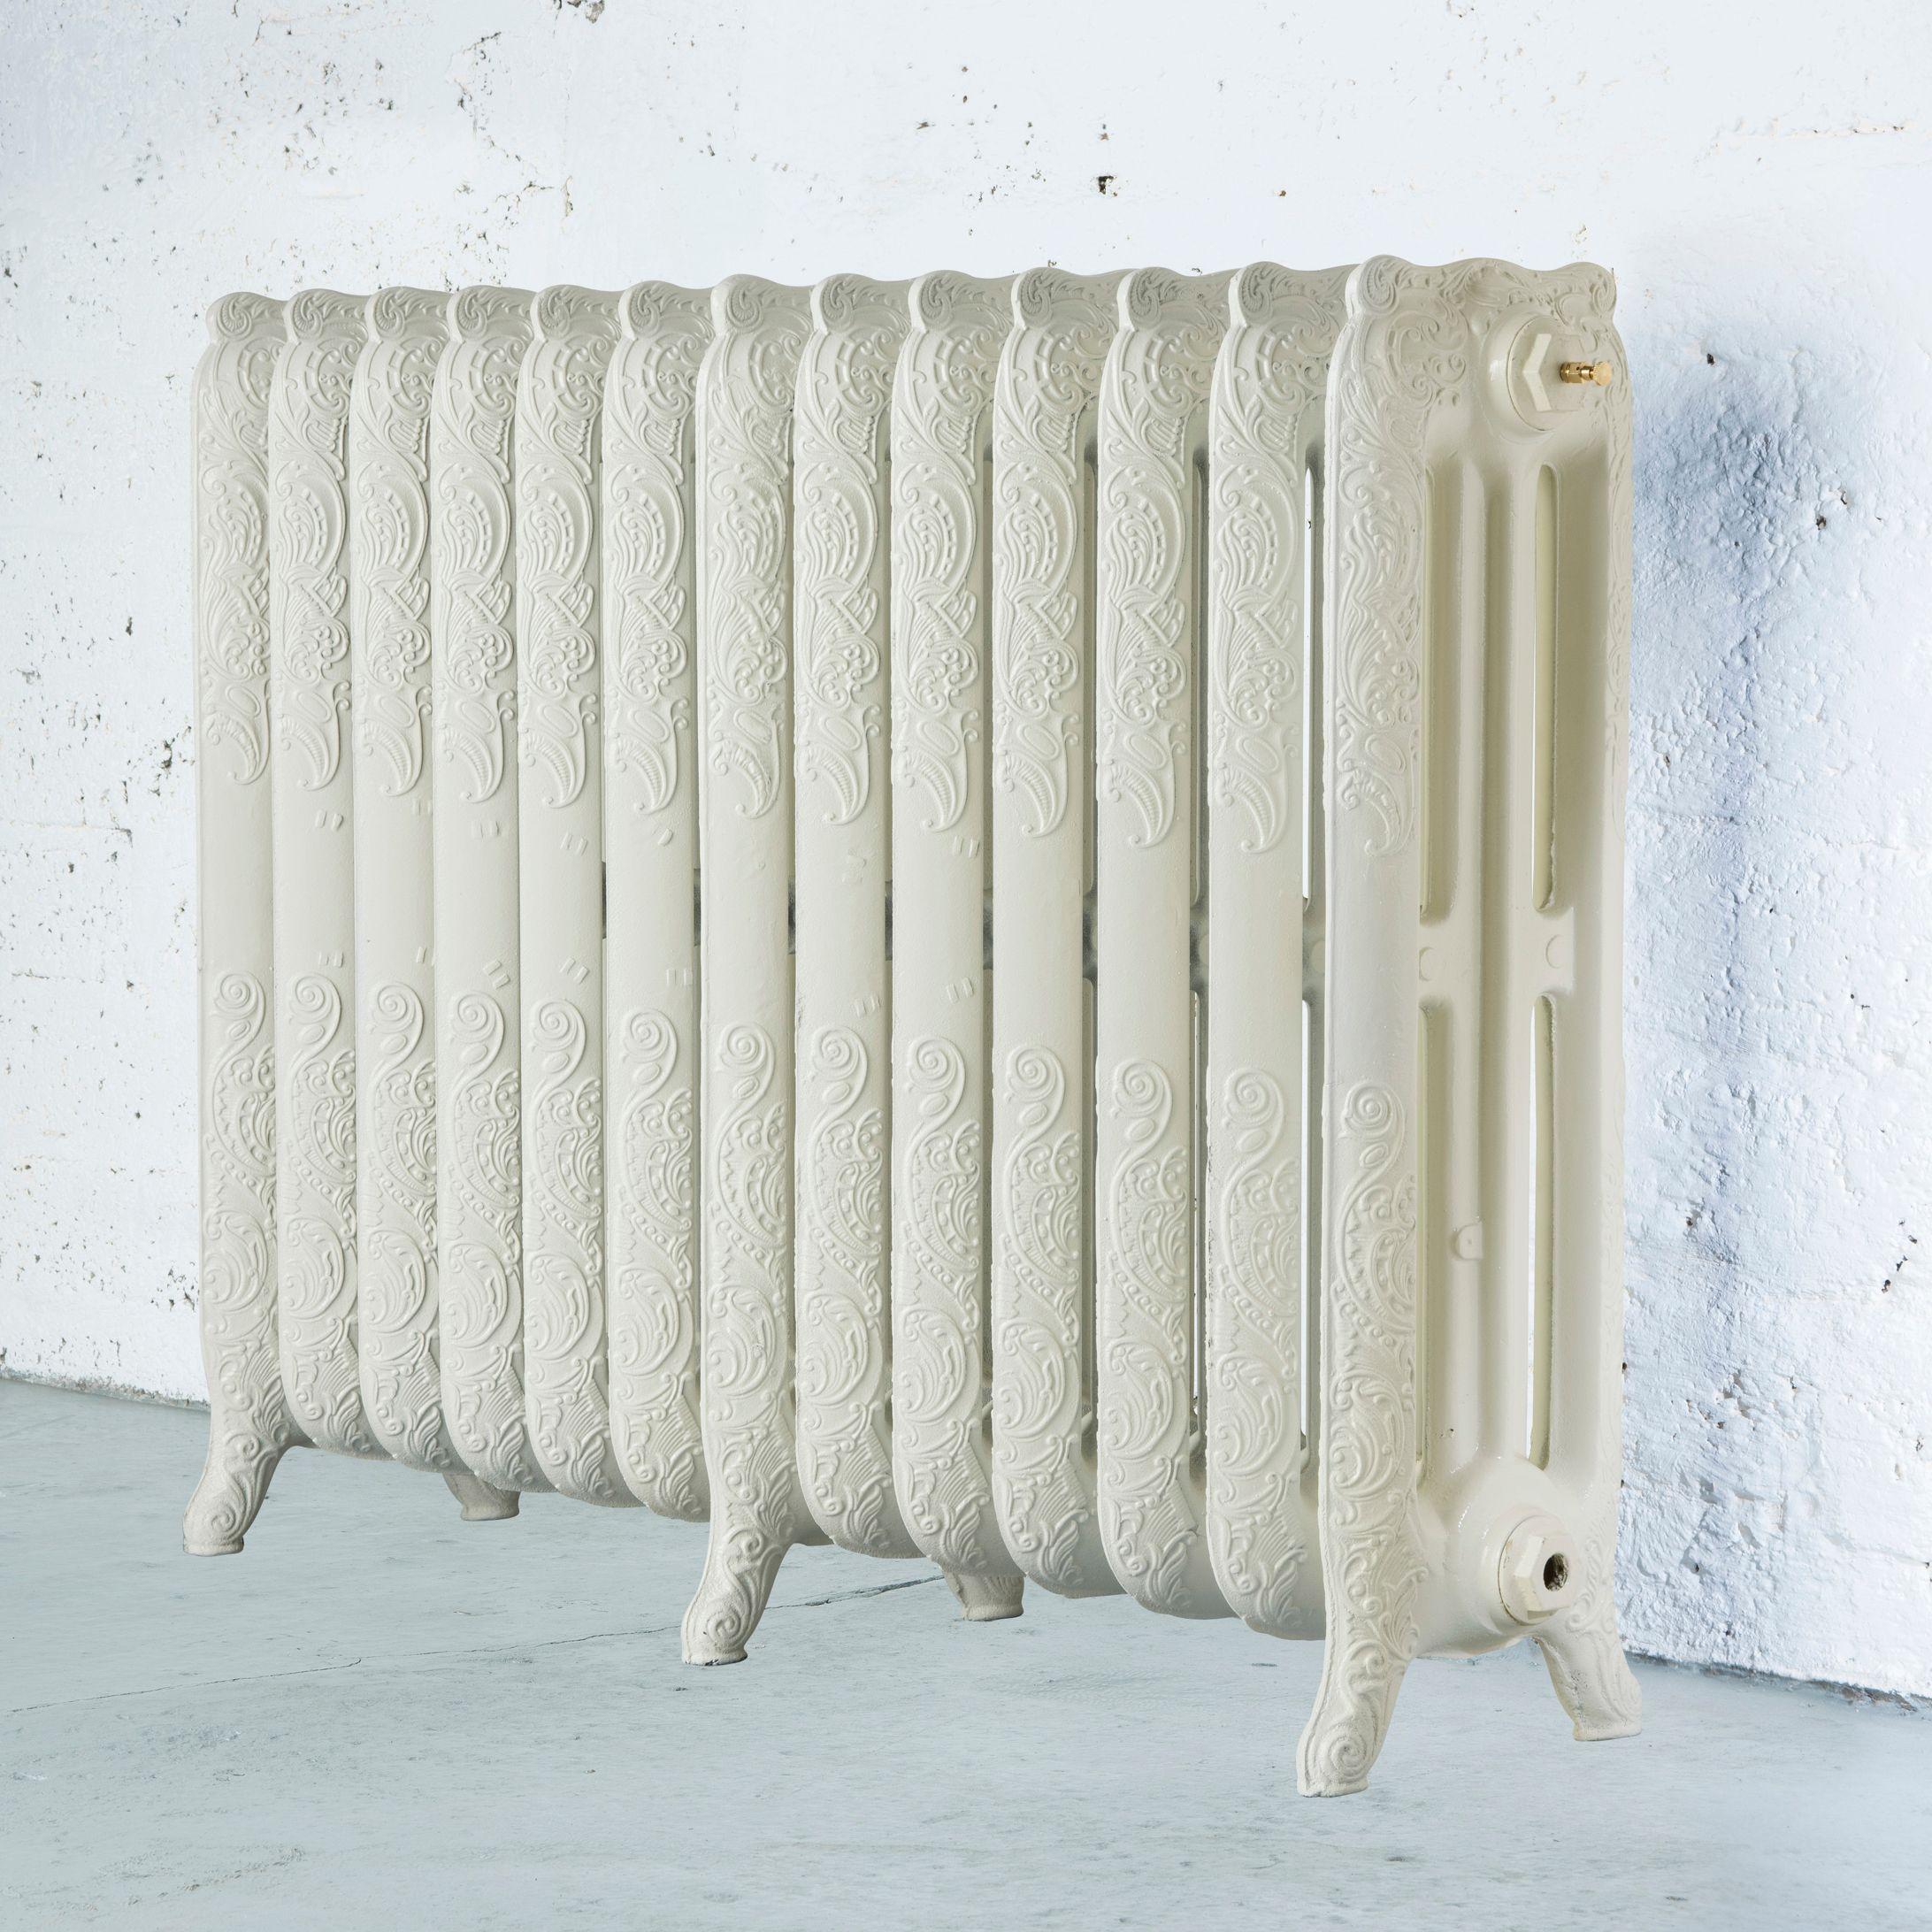 Arroll Montmartre 3 Column radiator, Cream (W)1154mm (H)760mm